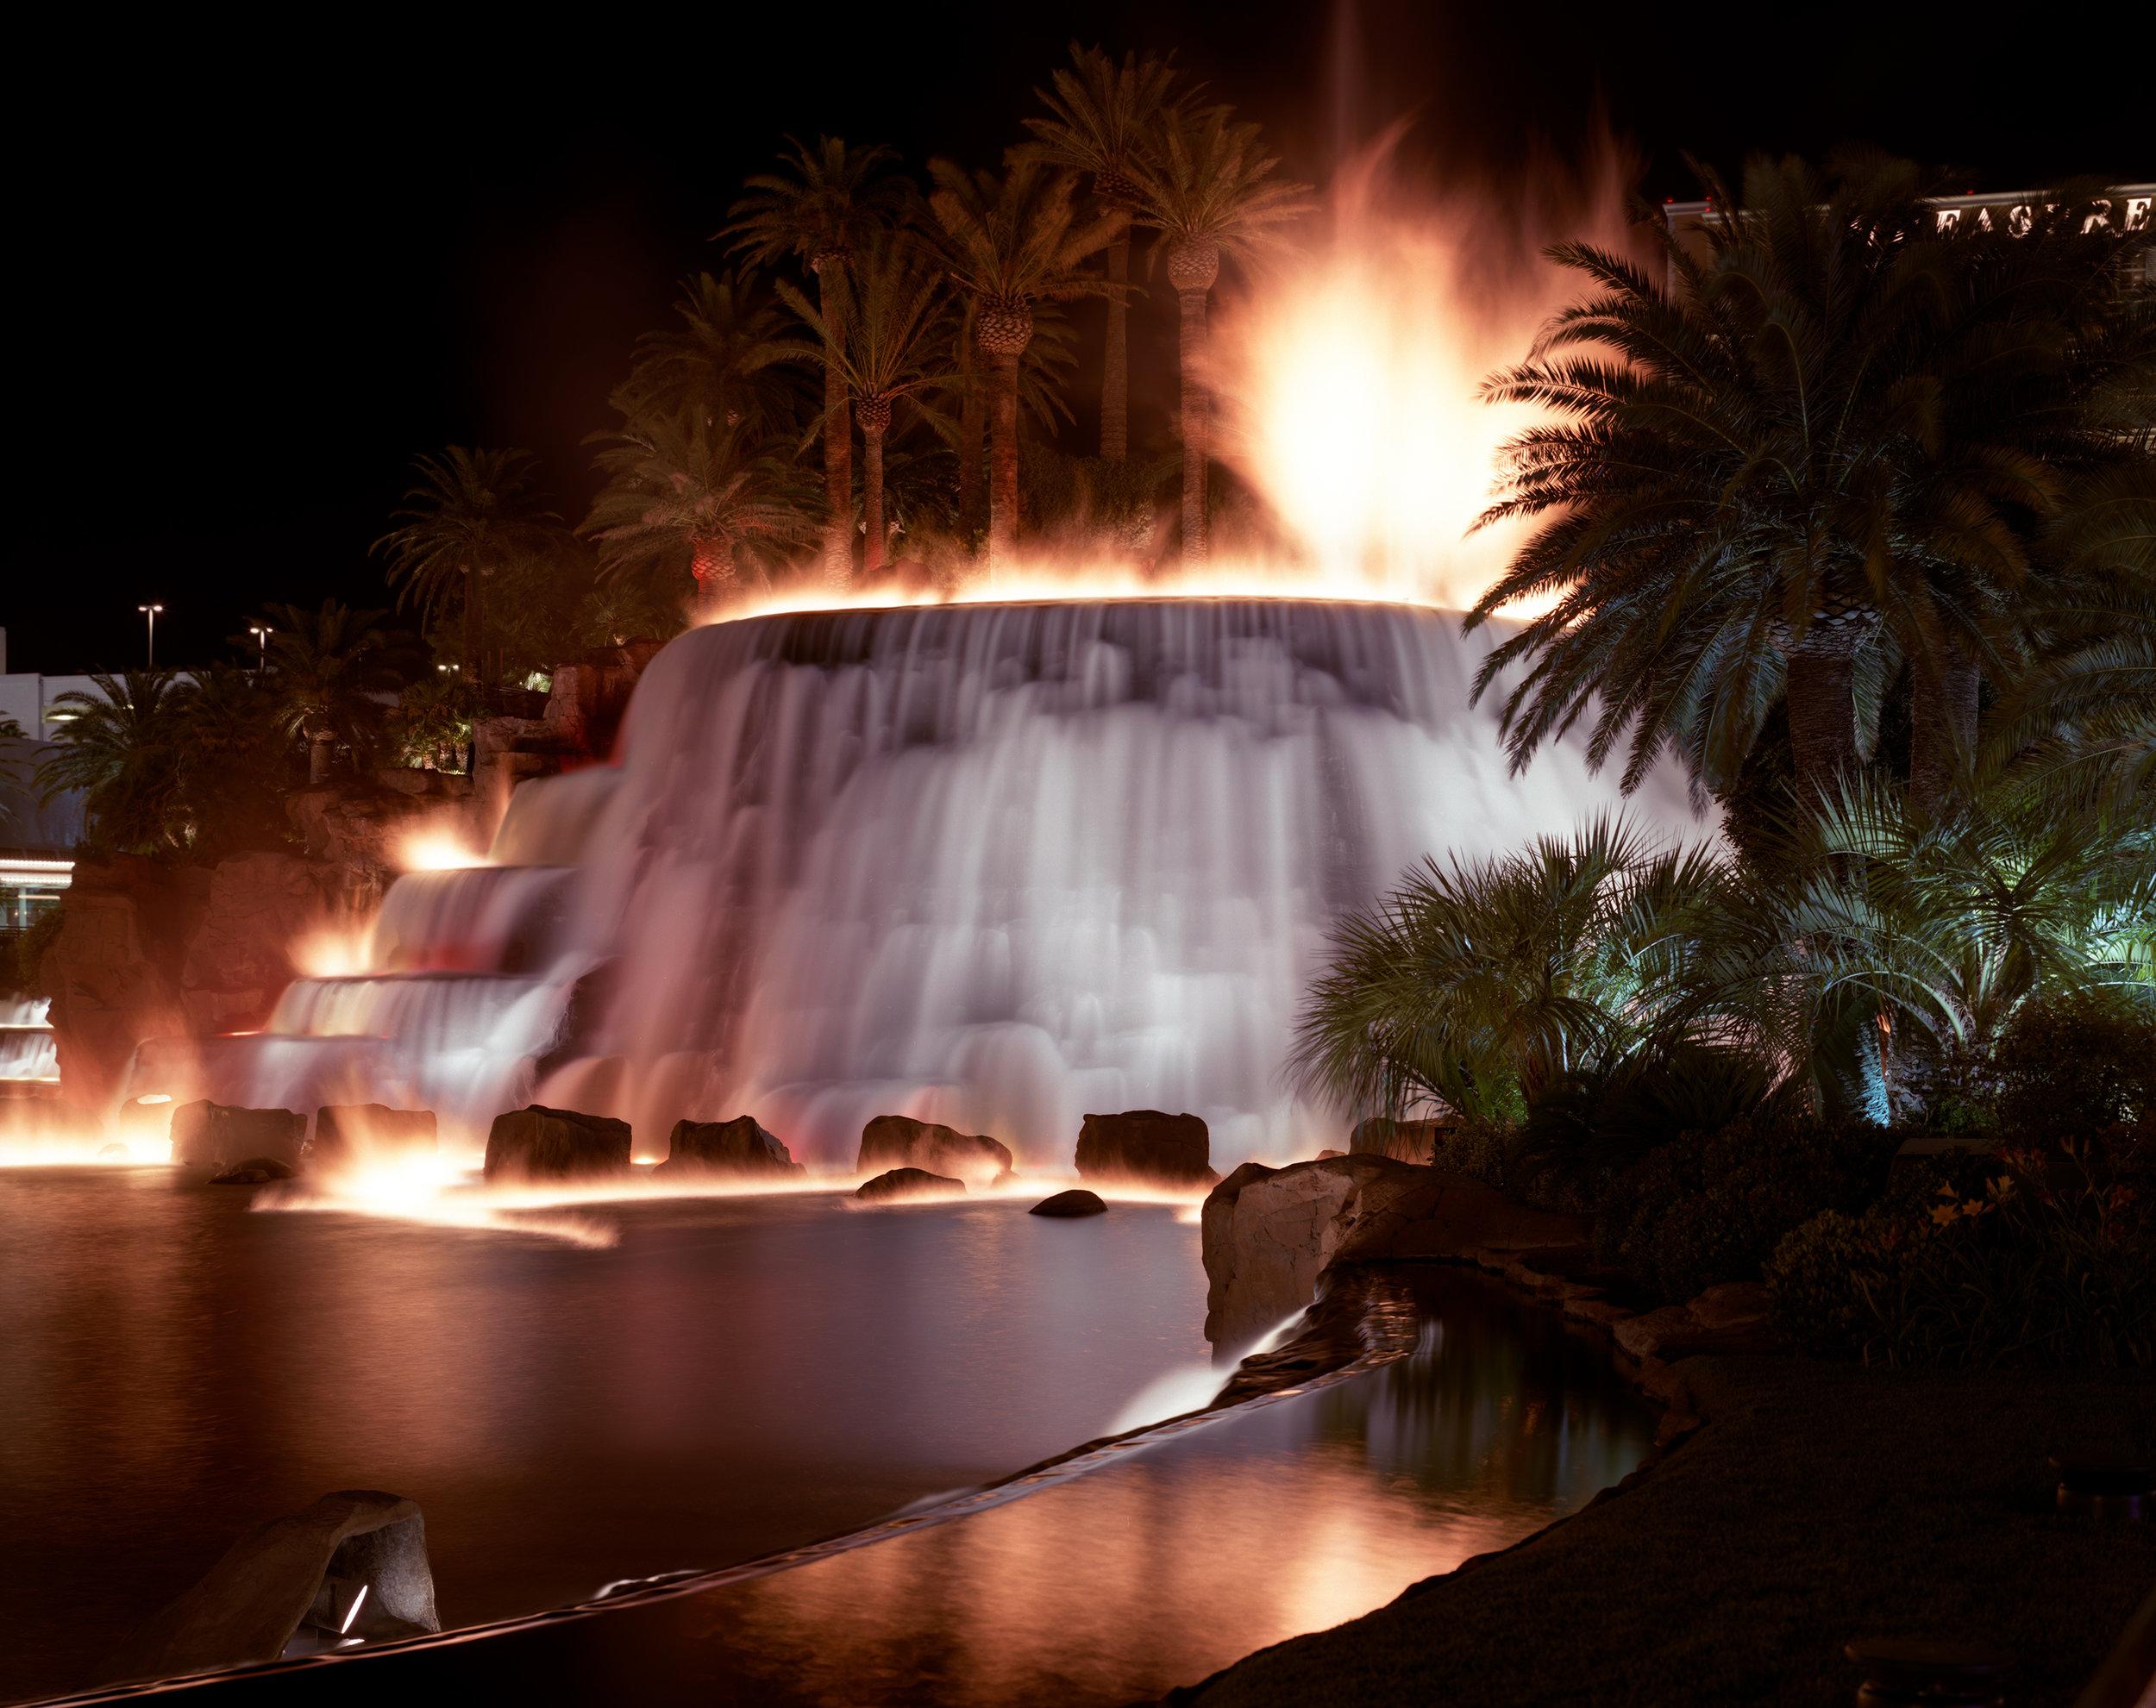 Artificial volcano erupting at the Mirage Hotel, Las Vegas, Nevada, 1995